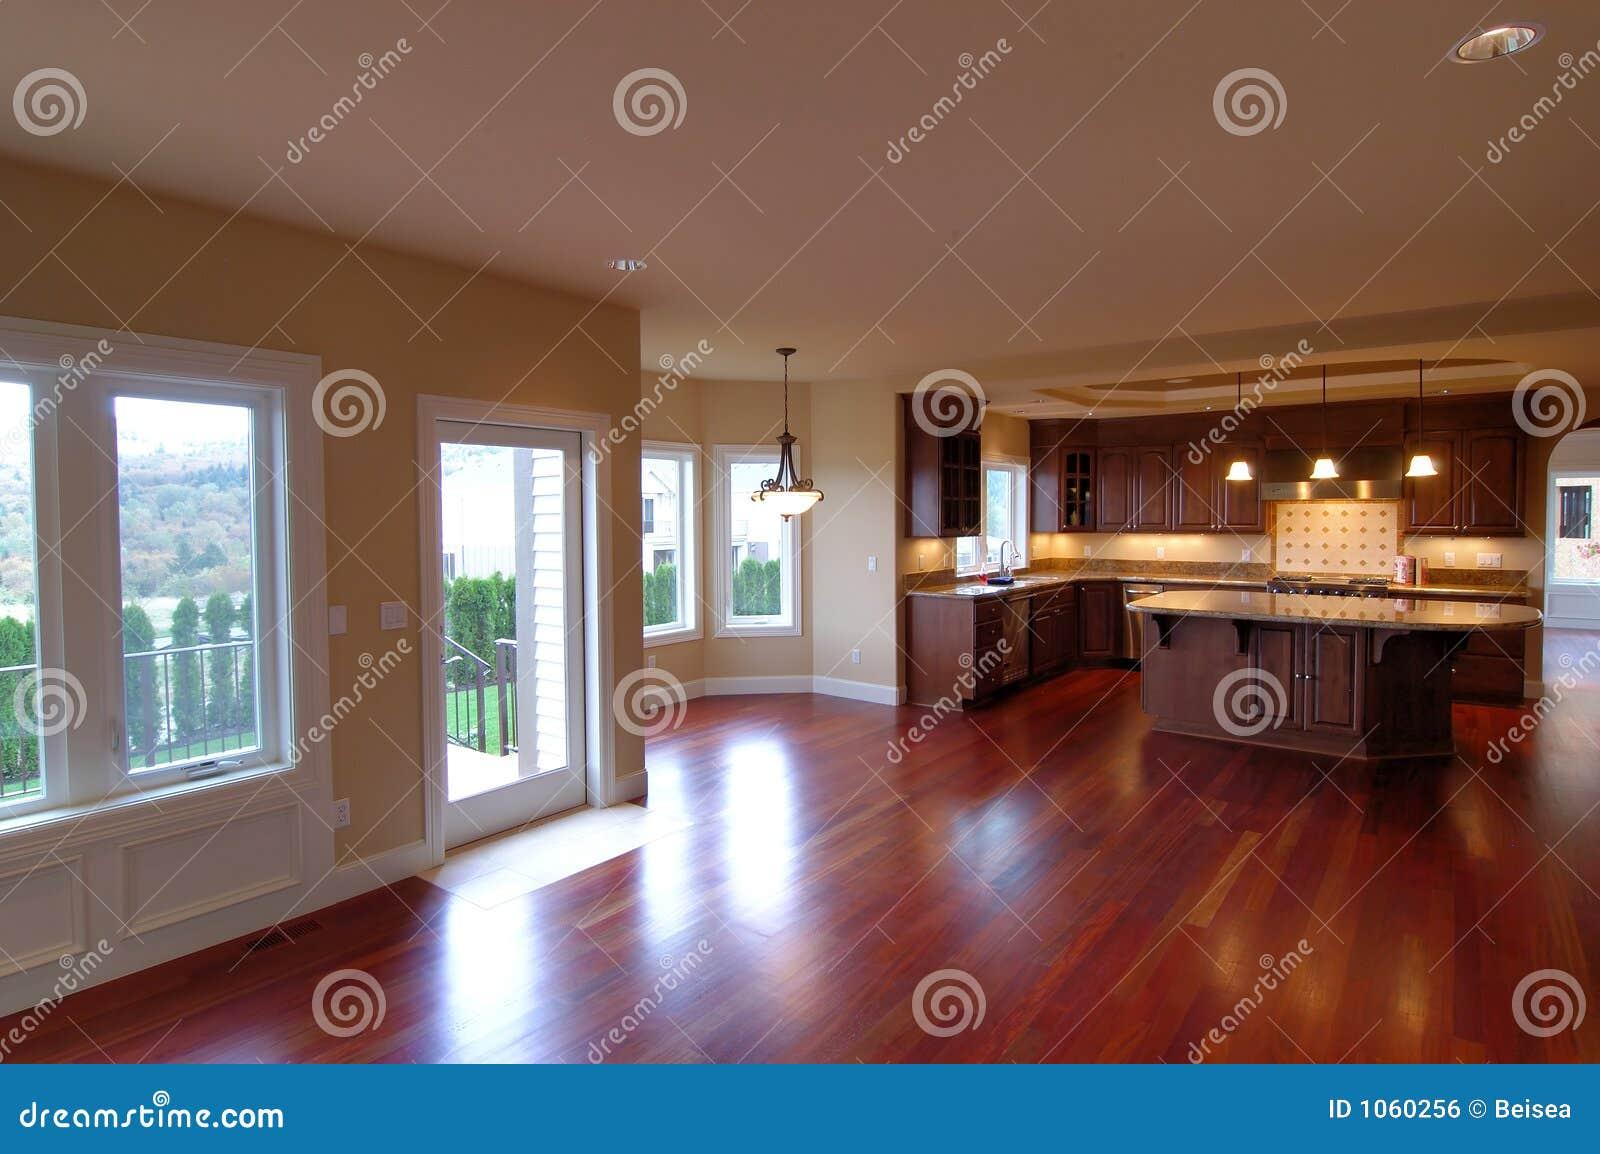 Casa americana luxuosa no 3 interior imagem de stock - Casas americanas interior ...